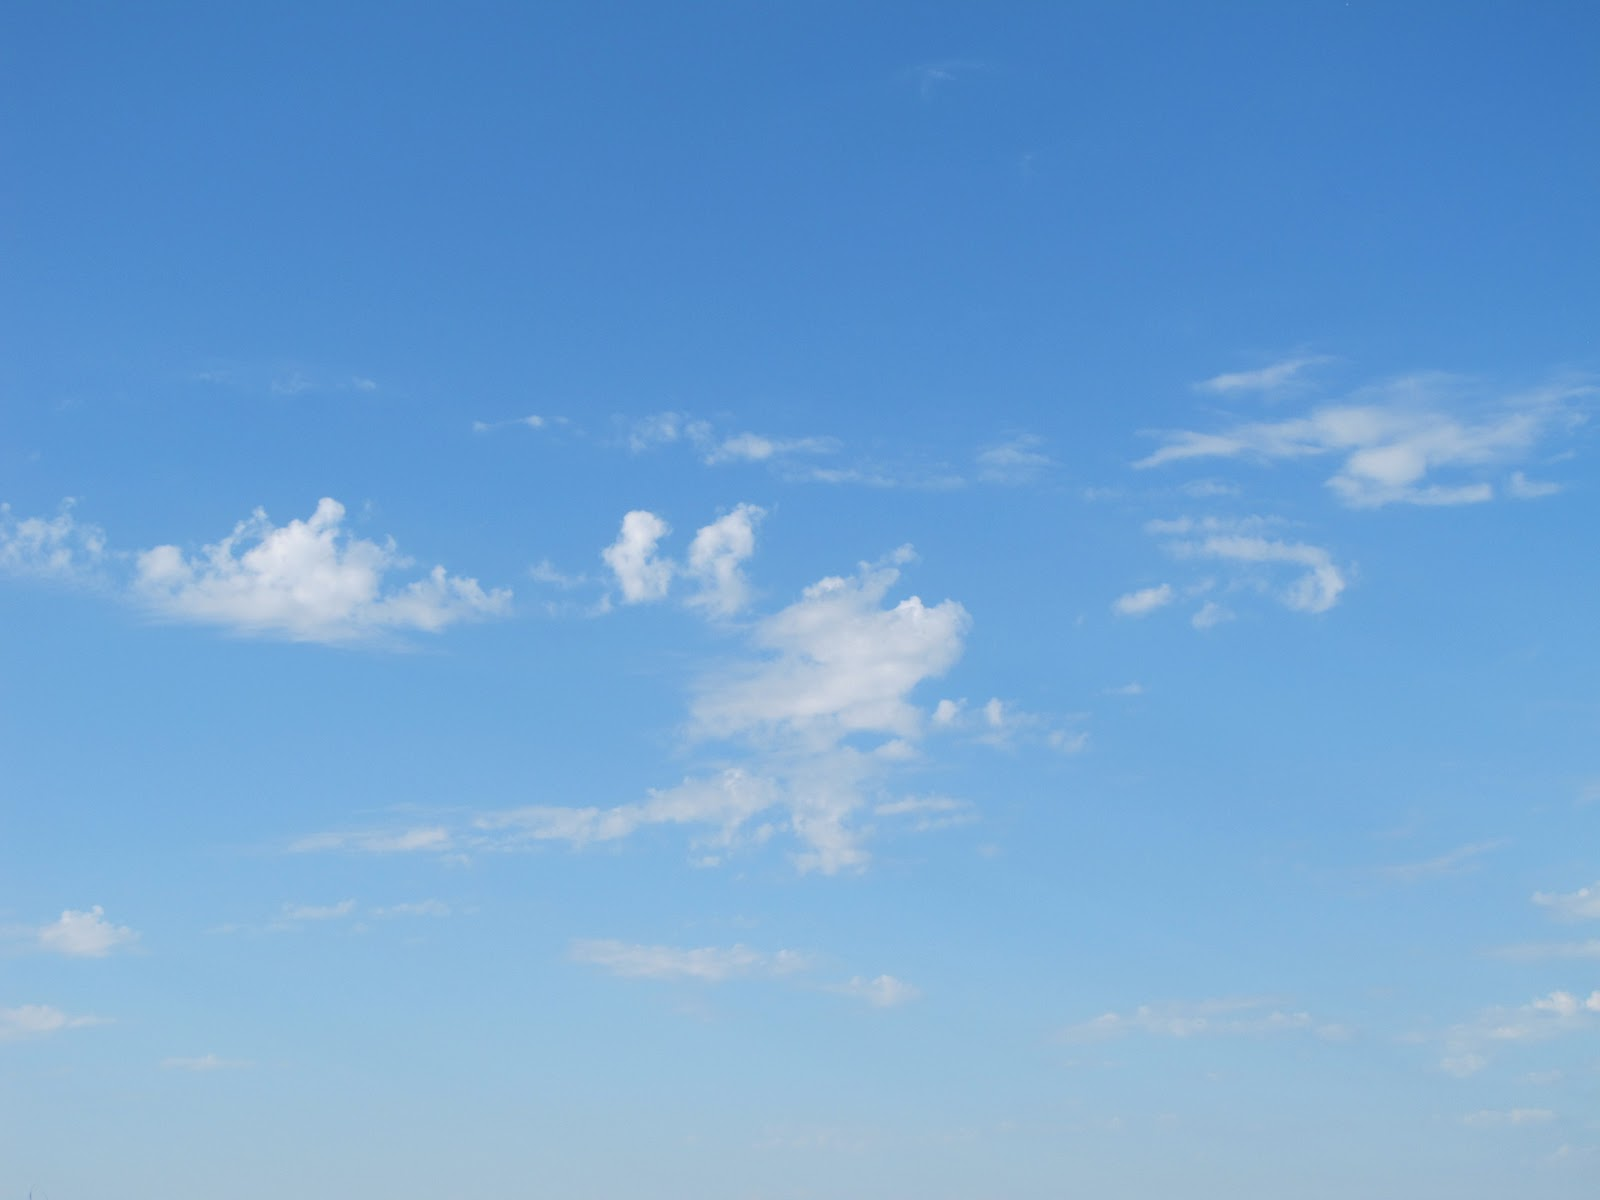 Les merveilles de danielle septembre 2011 - Image ciel bleu clair ...